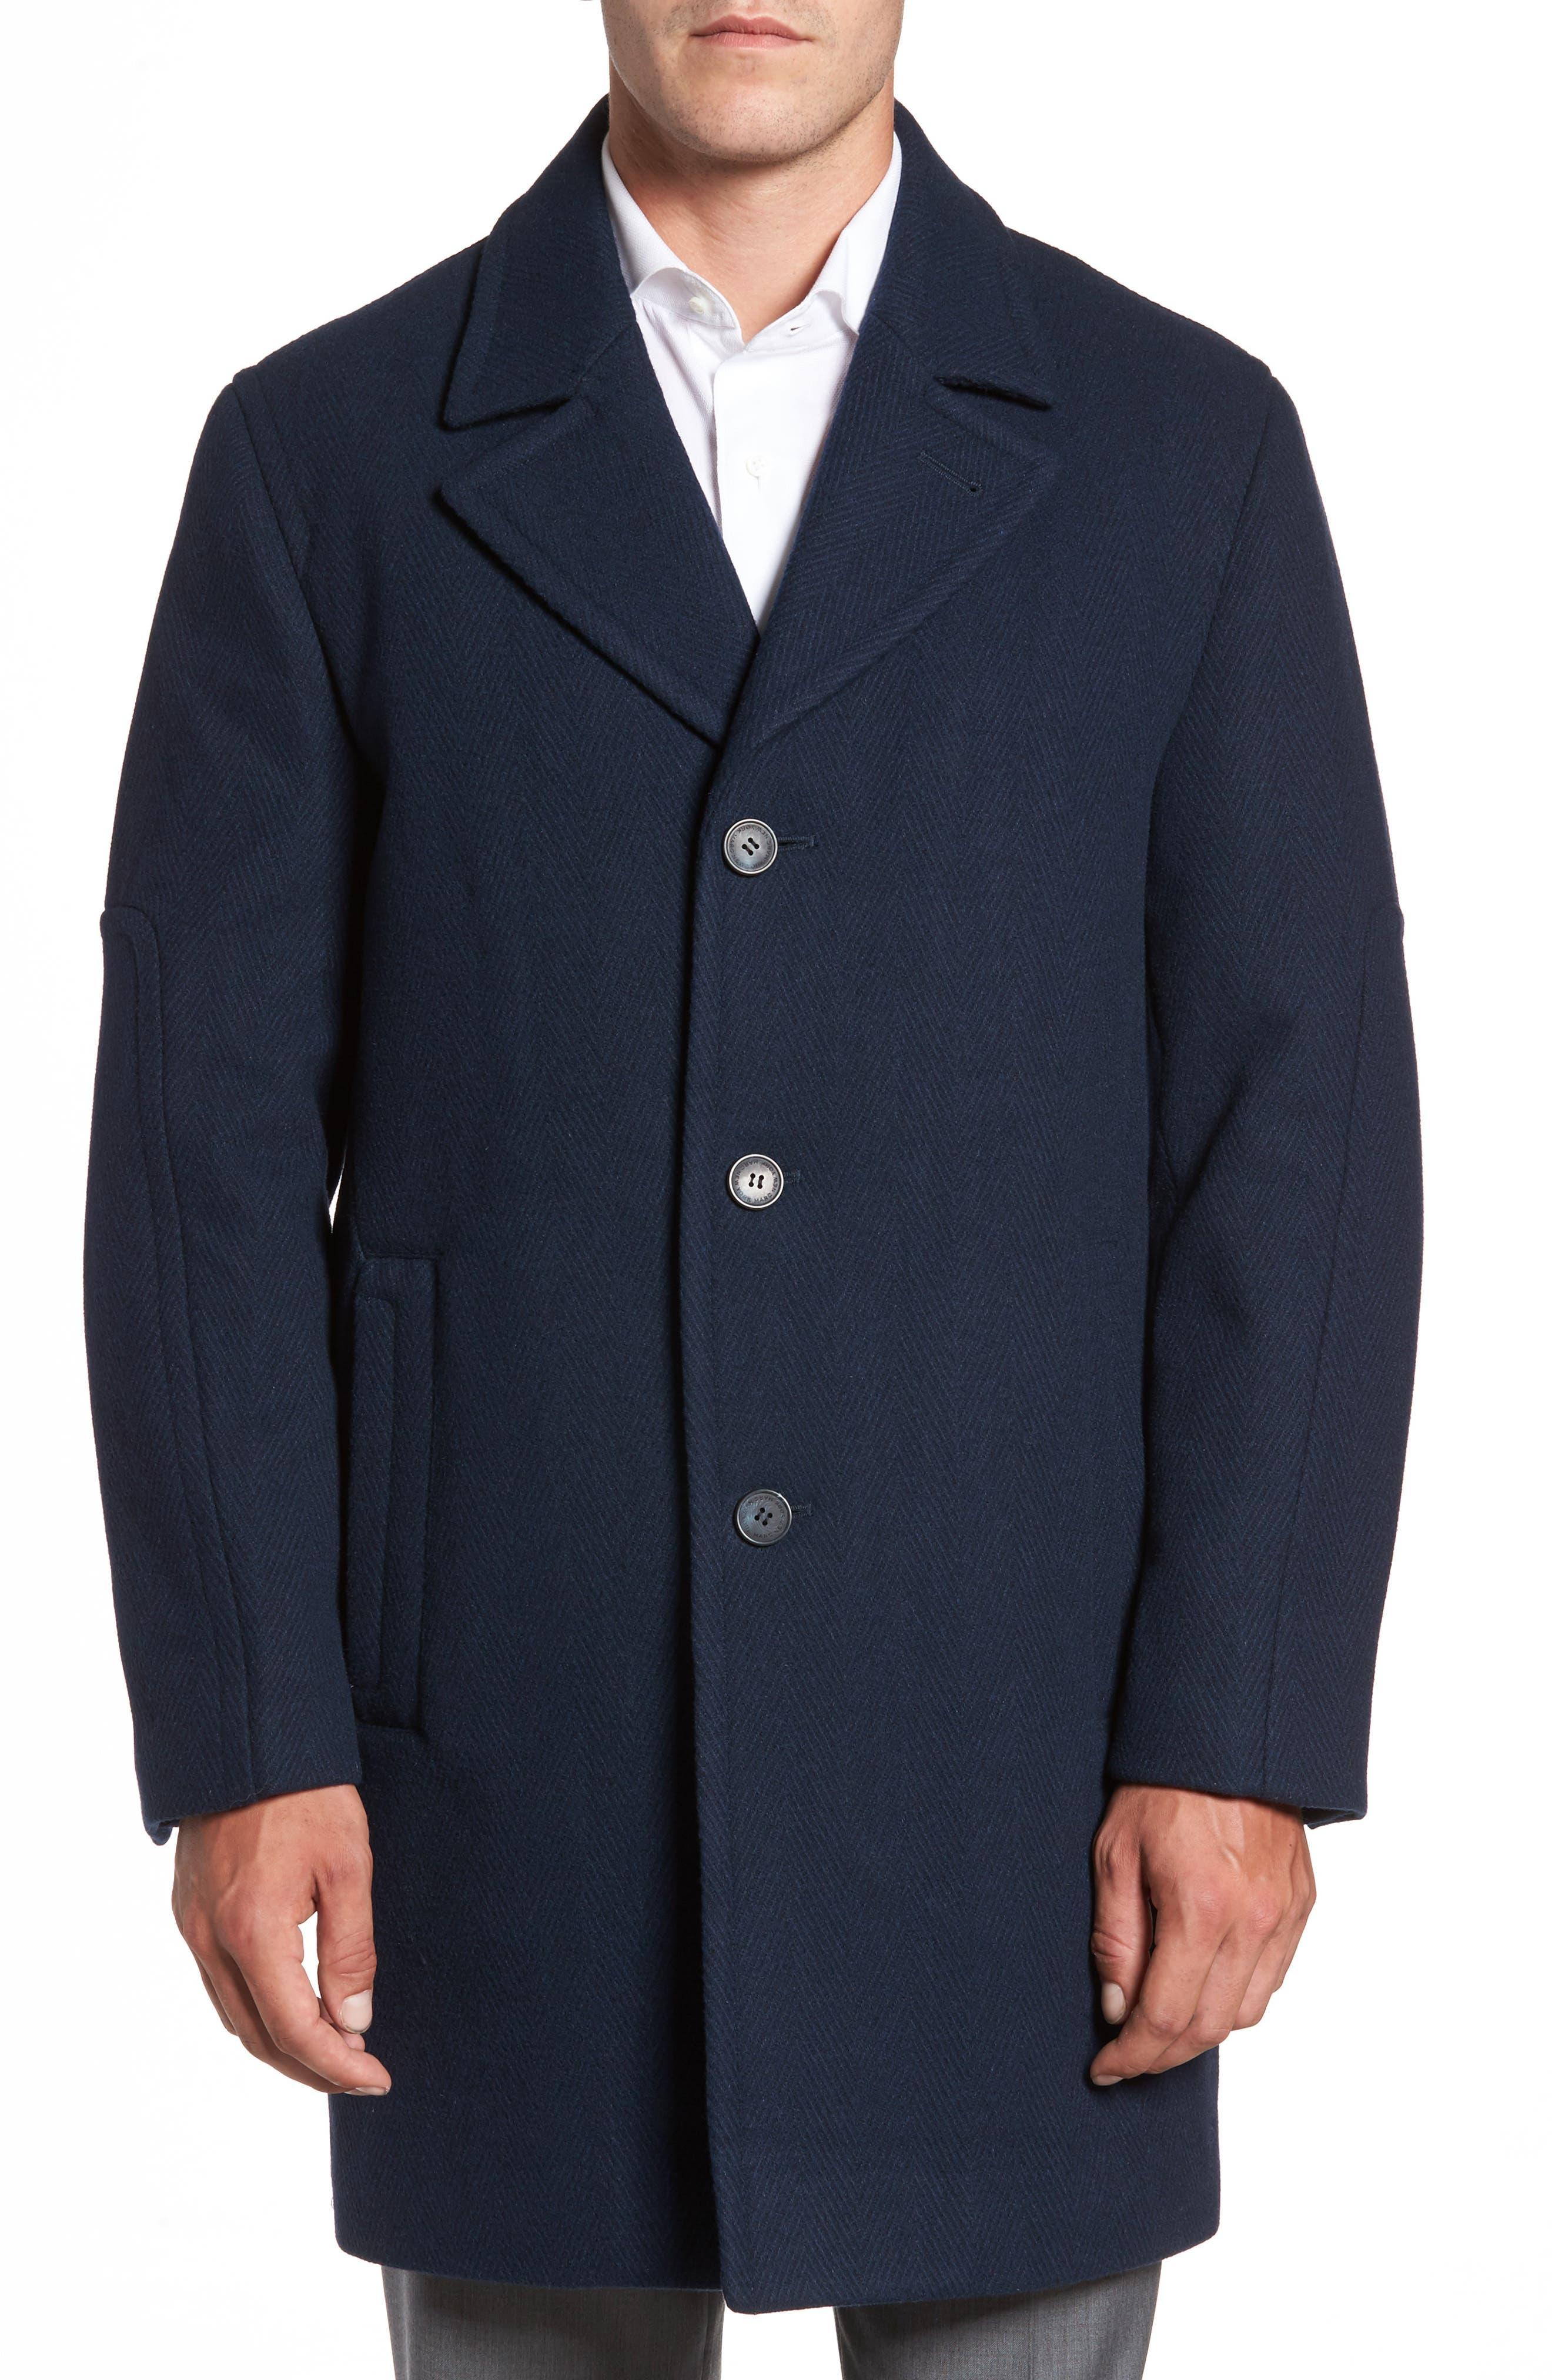 Alternate Image 1 Selected - Marc New York Herringbone Wool Blend Car Coat